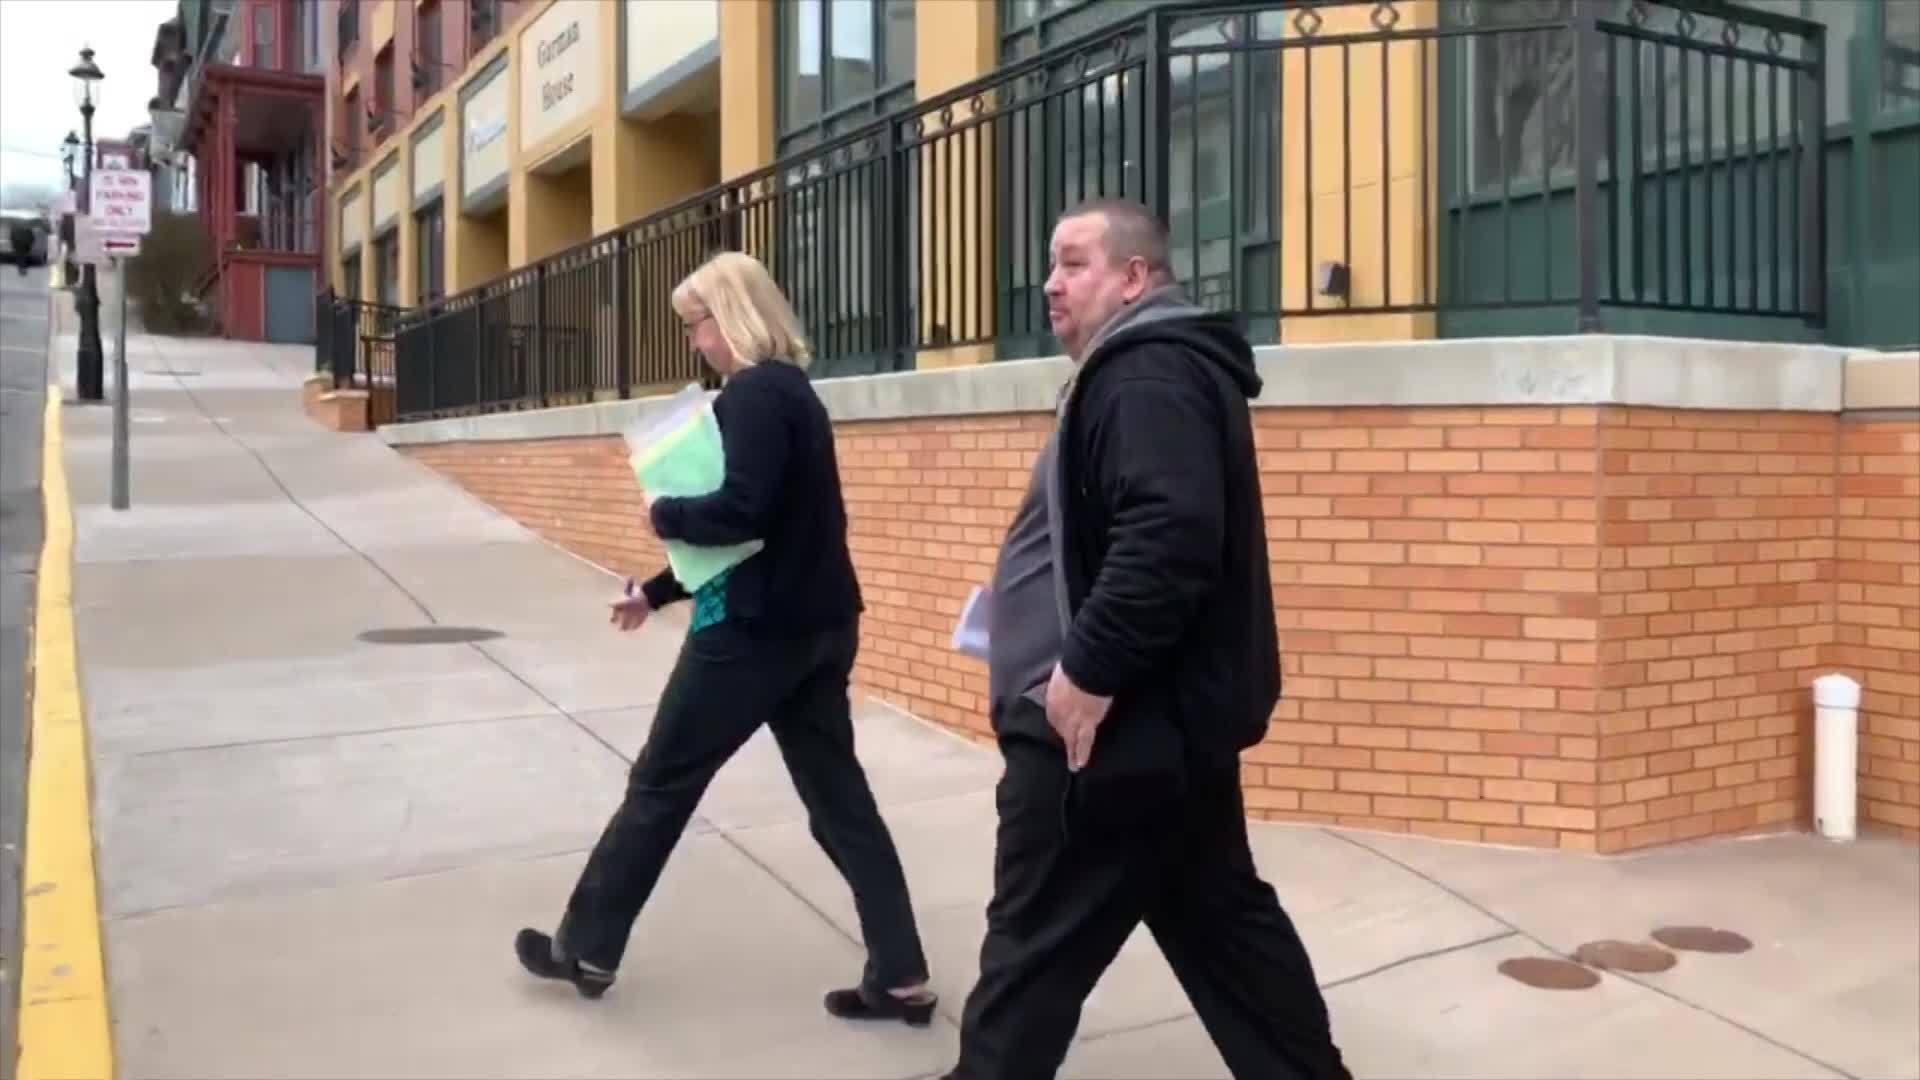 Former_PSU_employee_sentenced_after_vide_0_20190411212152